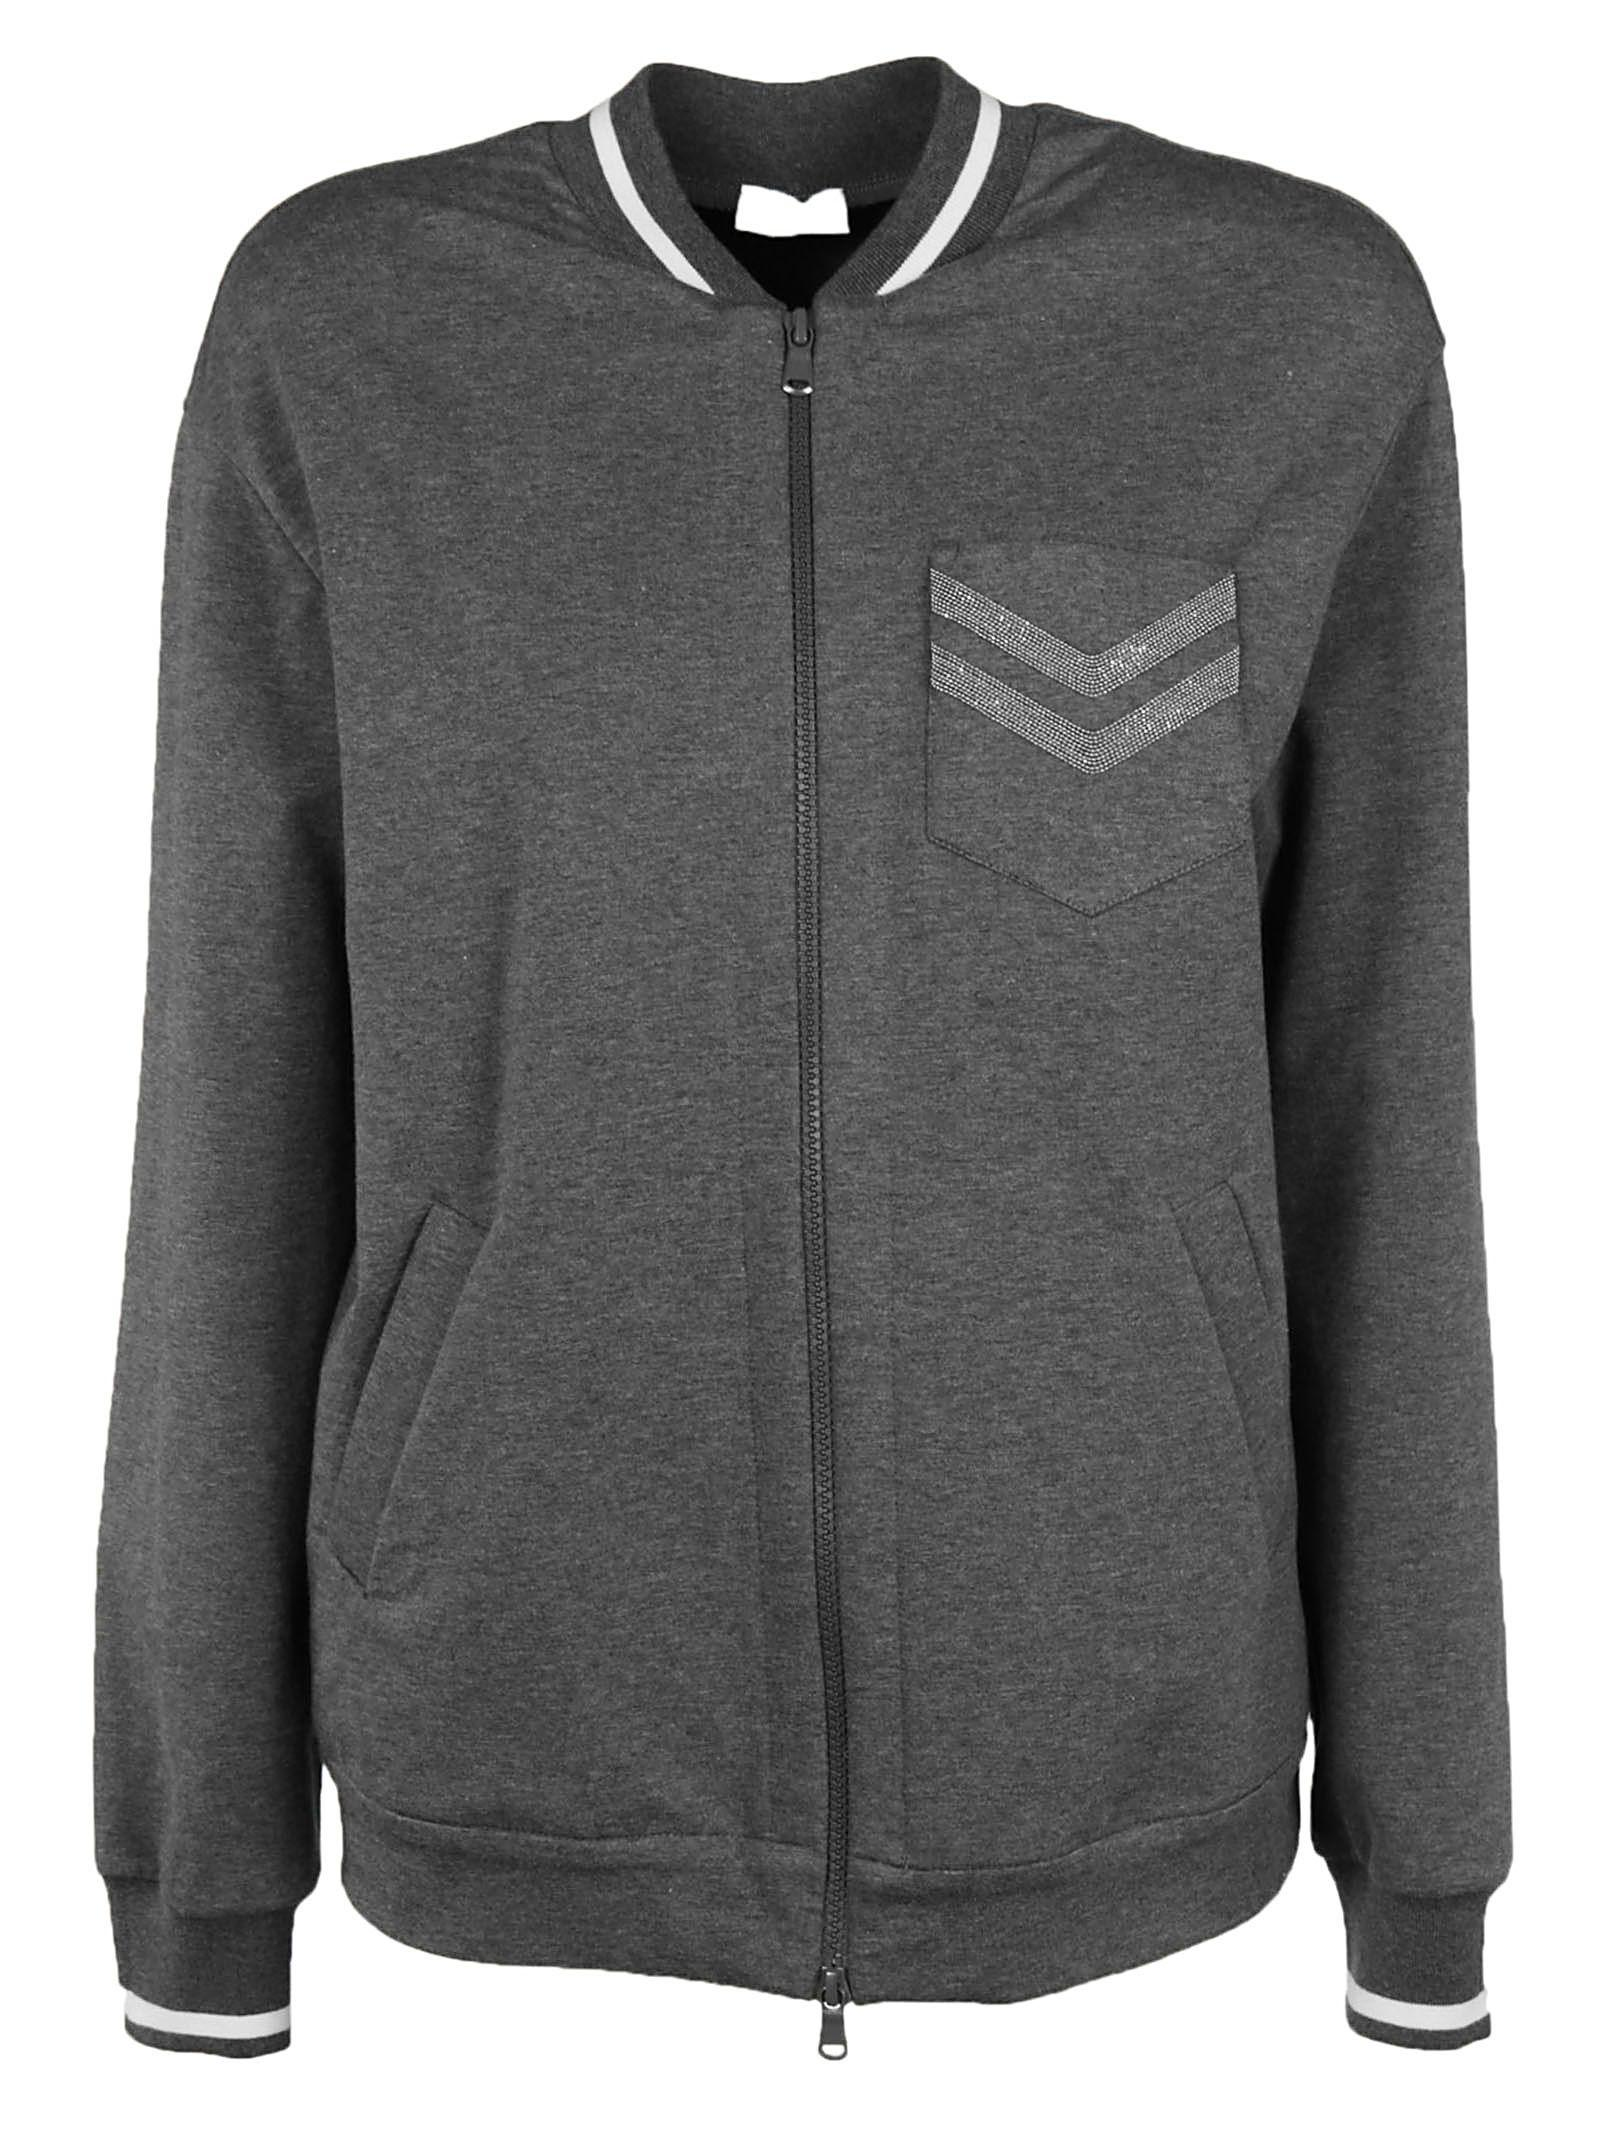 Brunello Cucinelli Zipped Jacket In Grey